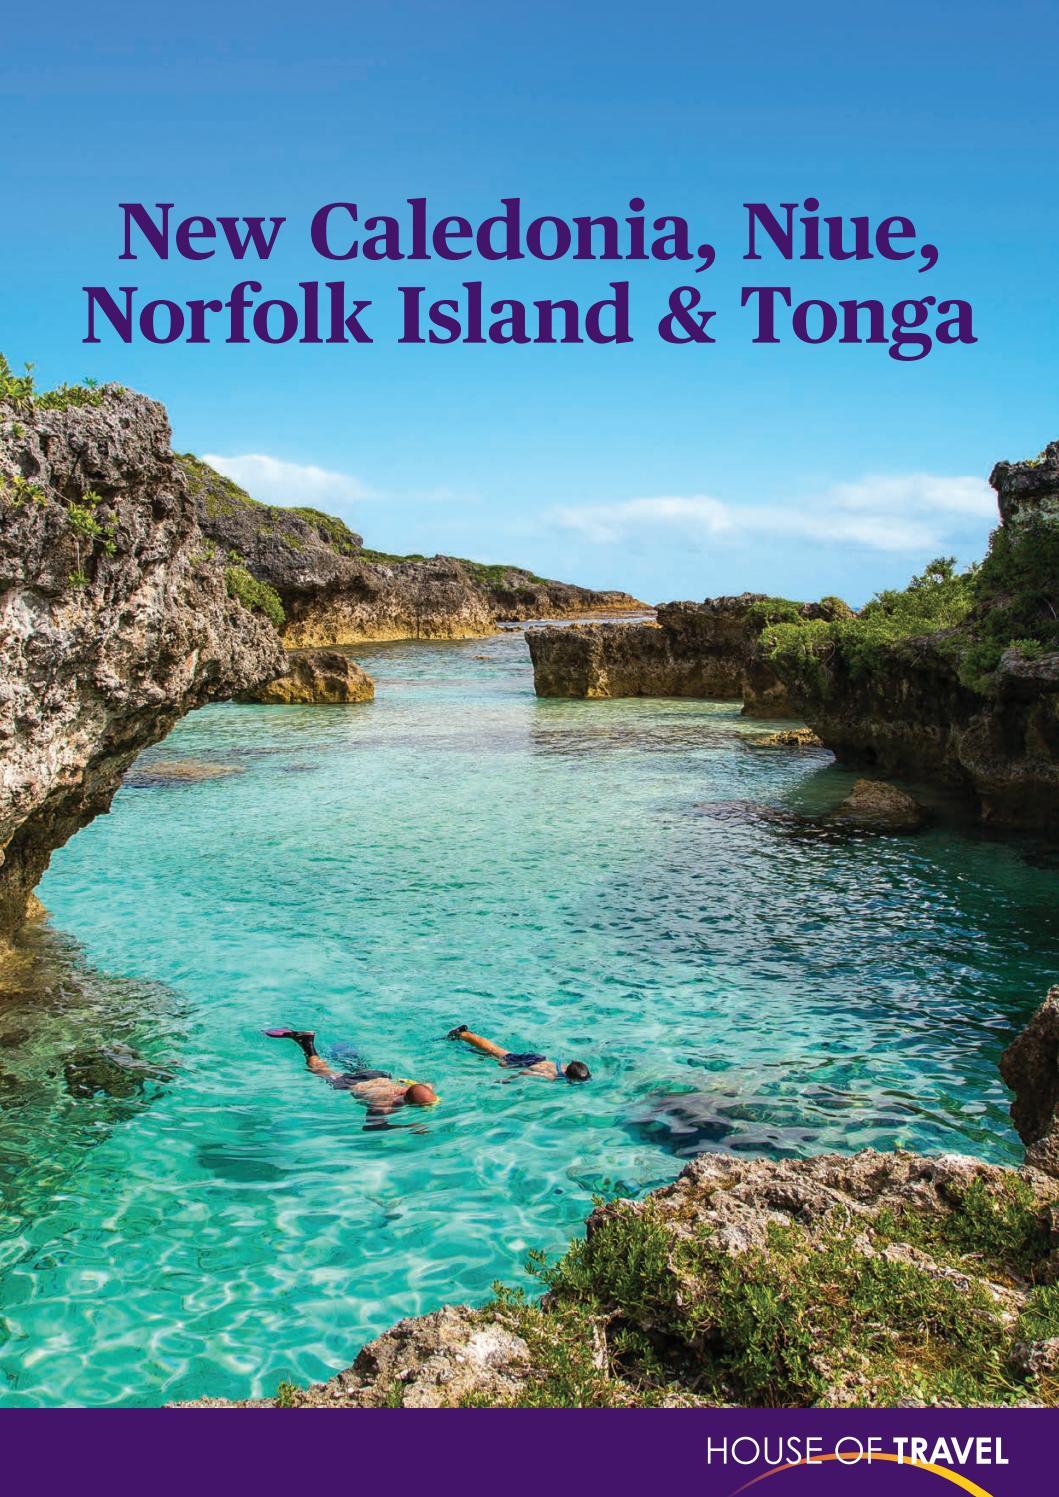 new caledonia  niue  norfolk island  u0026 tonga brochure 2017